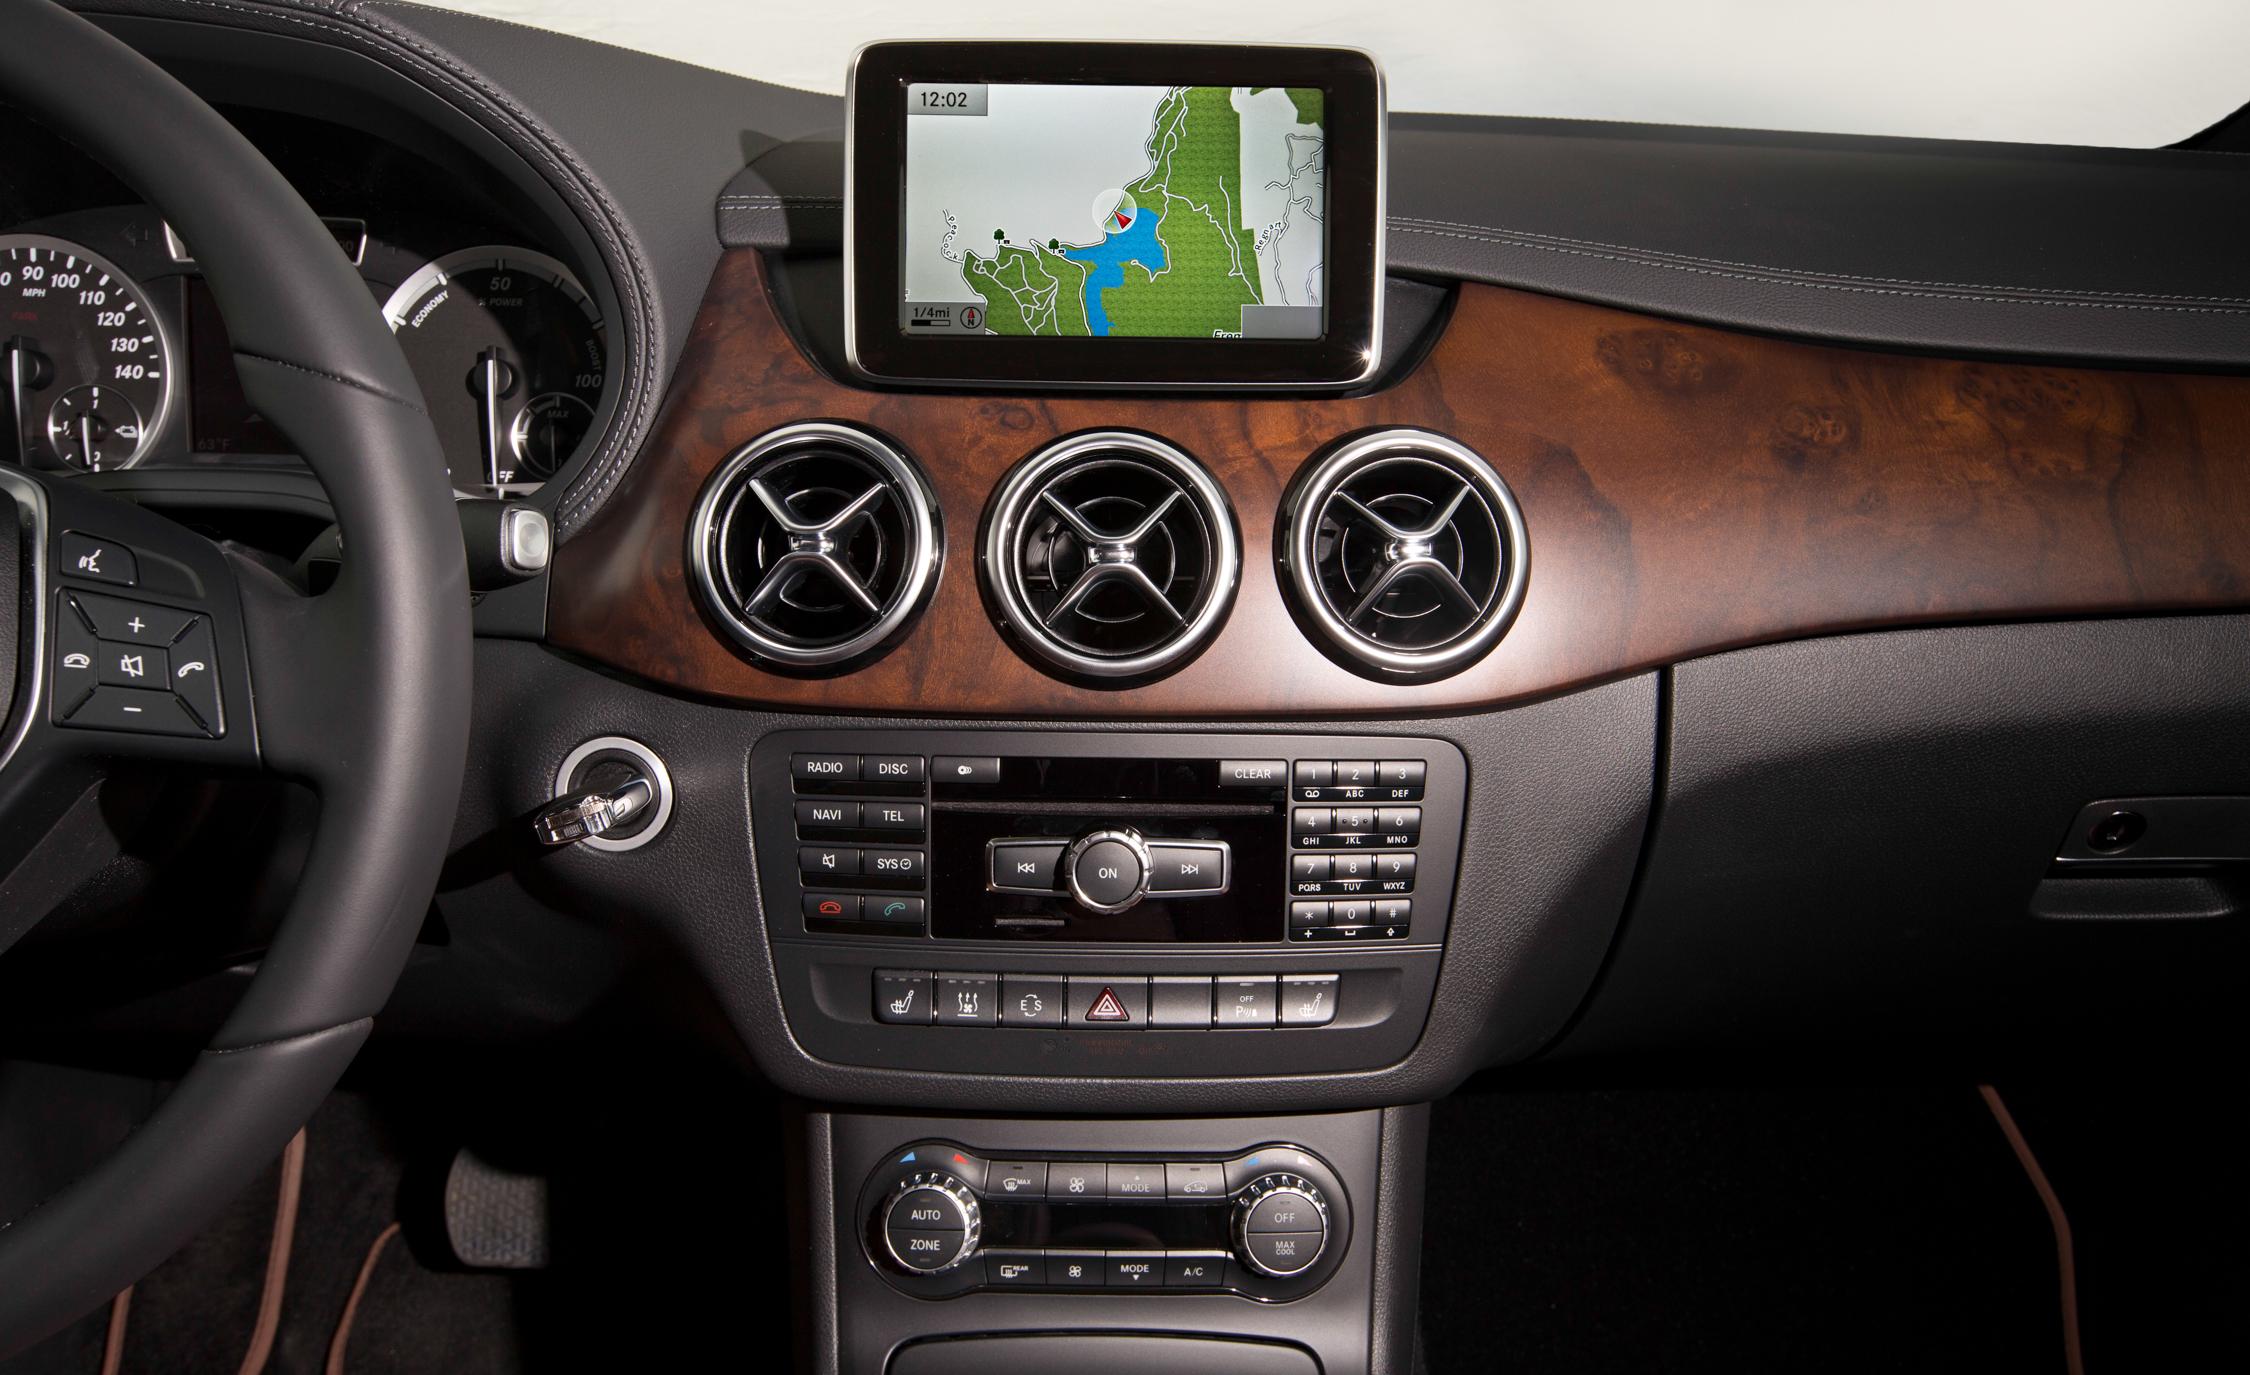 2014 Mercedes-Benz B-class Electric Drive Interior Center Head Unit